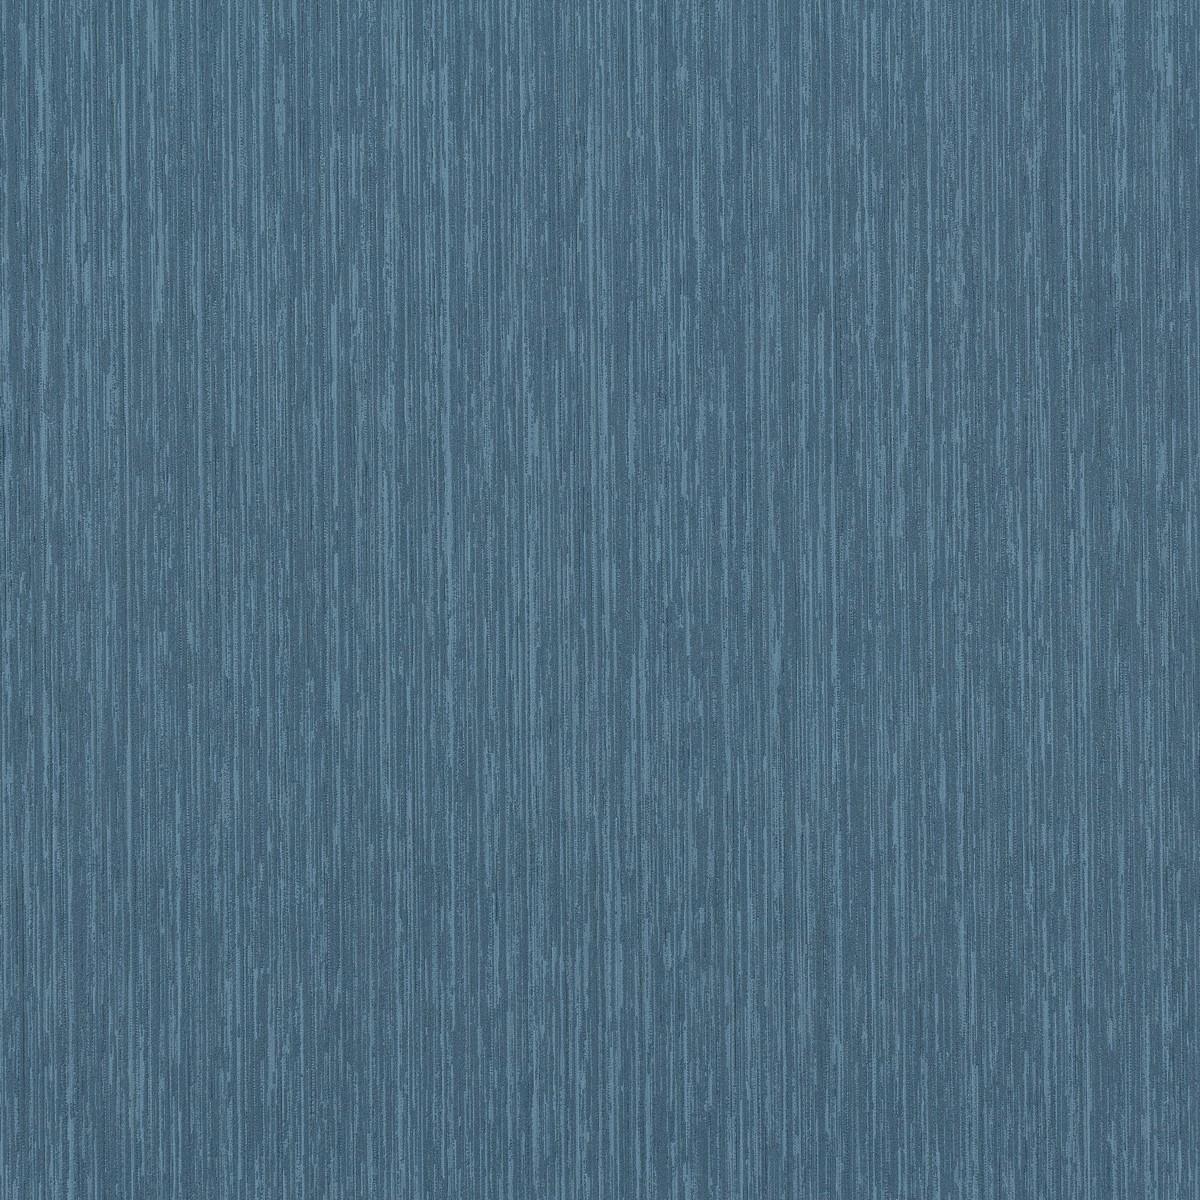 Tapete ornament vliesapete p s 13113 20 1311320 uni blau for Tapete ornament blau